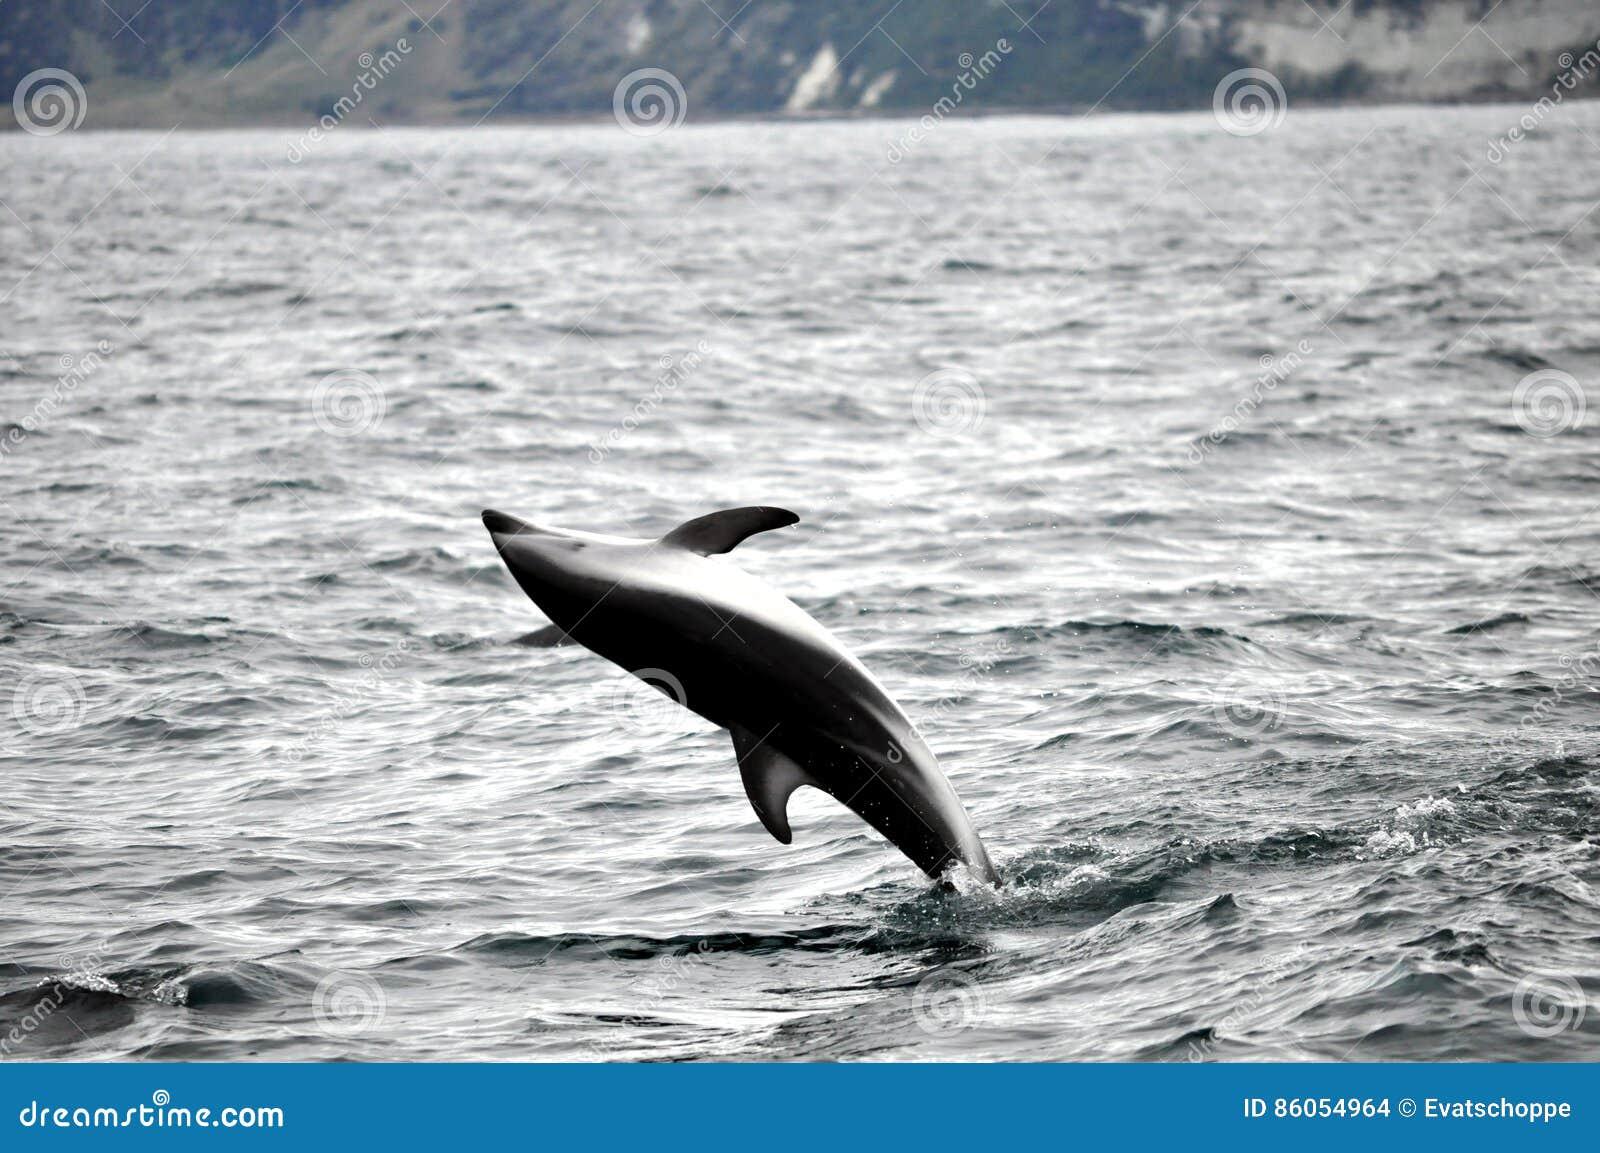 Jumping Dolphin in Kaikoura, New Zealand